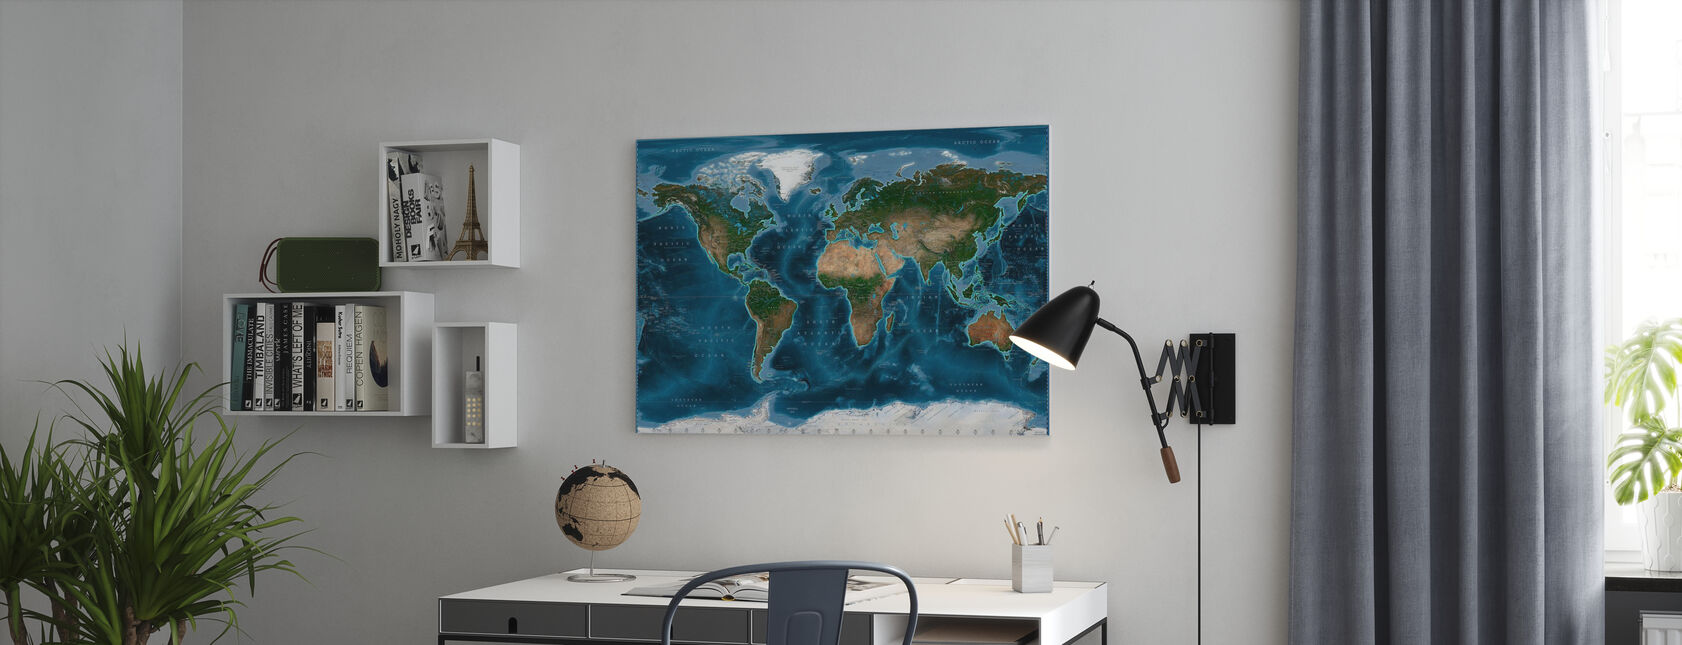 Satelite Karta - Canvastavla - Kontor